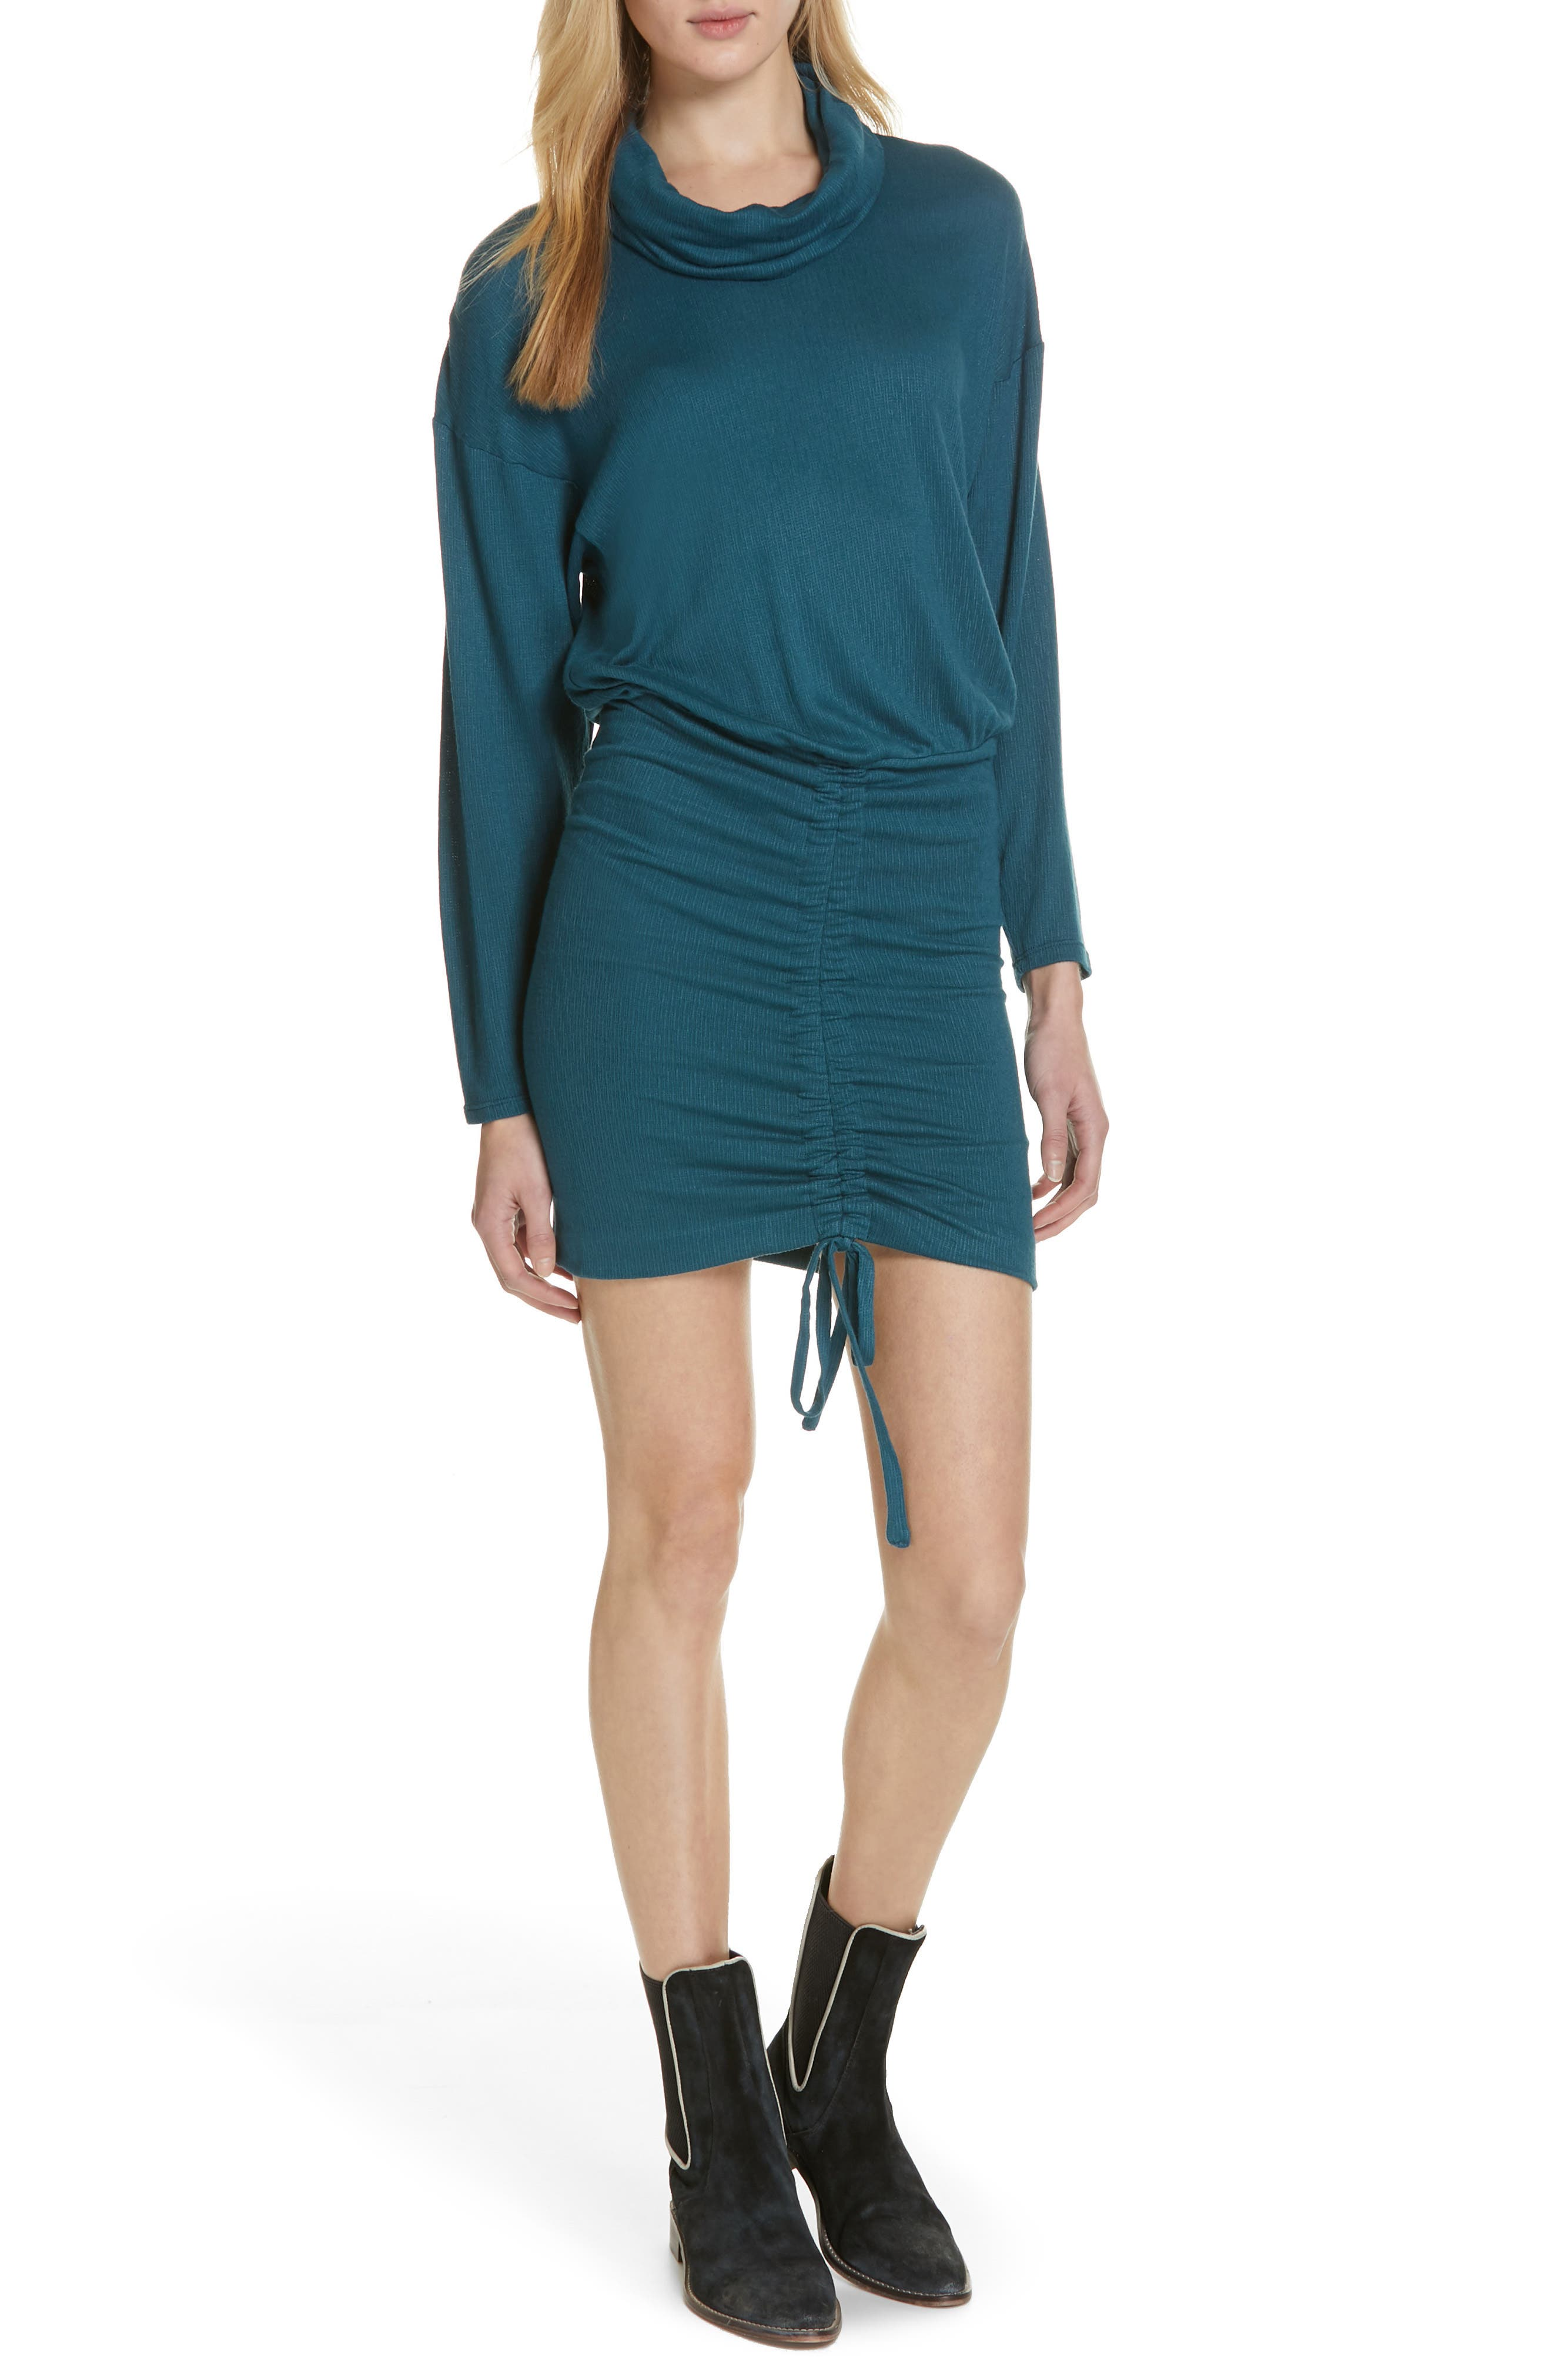 Free People Sundown Minidress, Blue/green